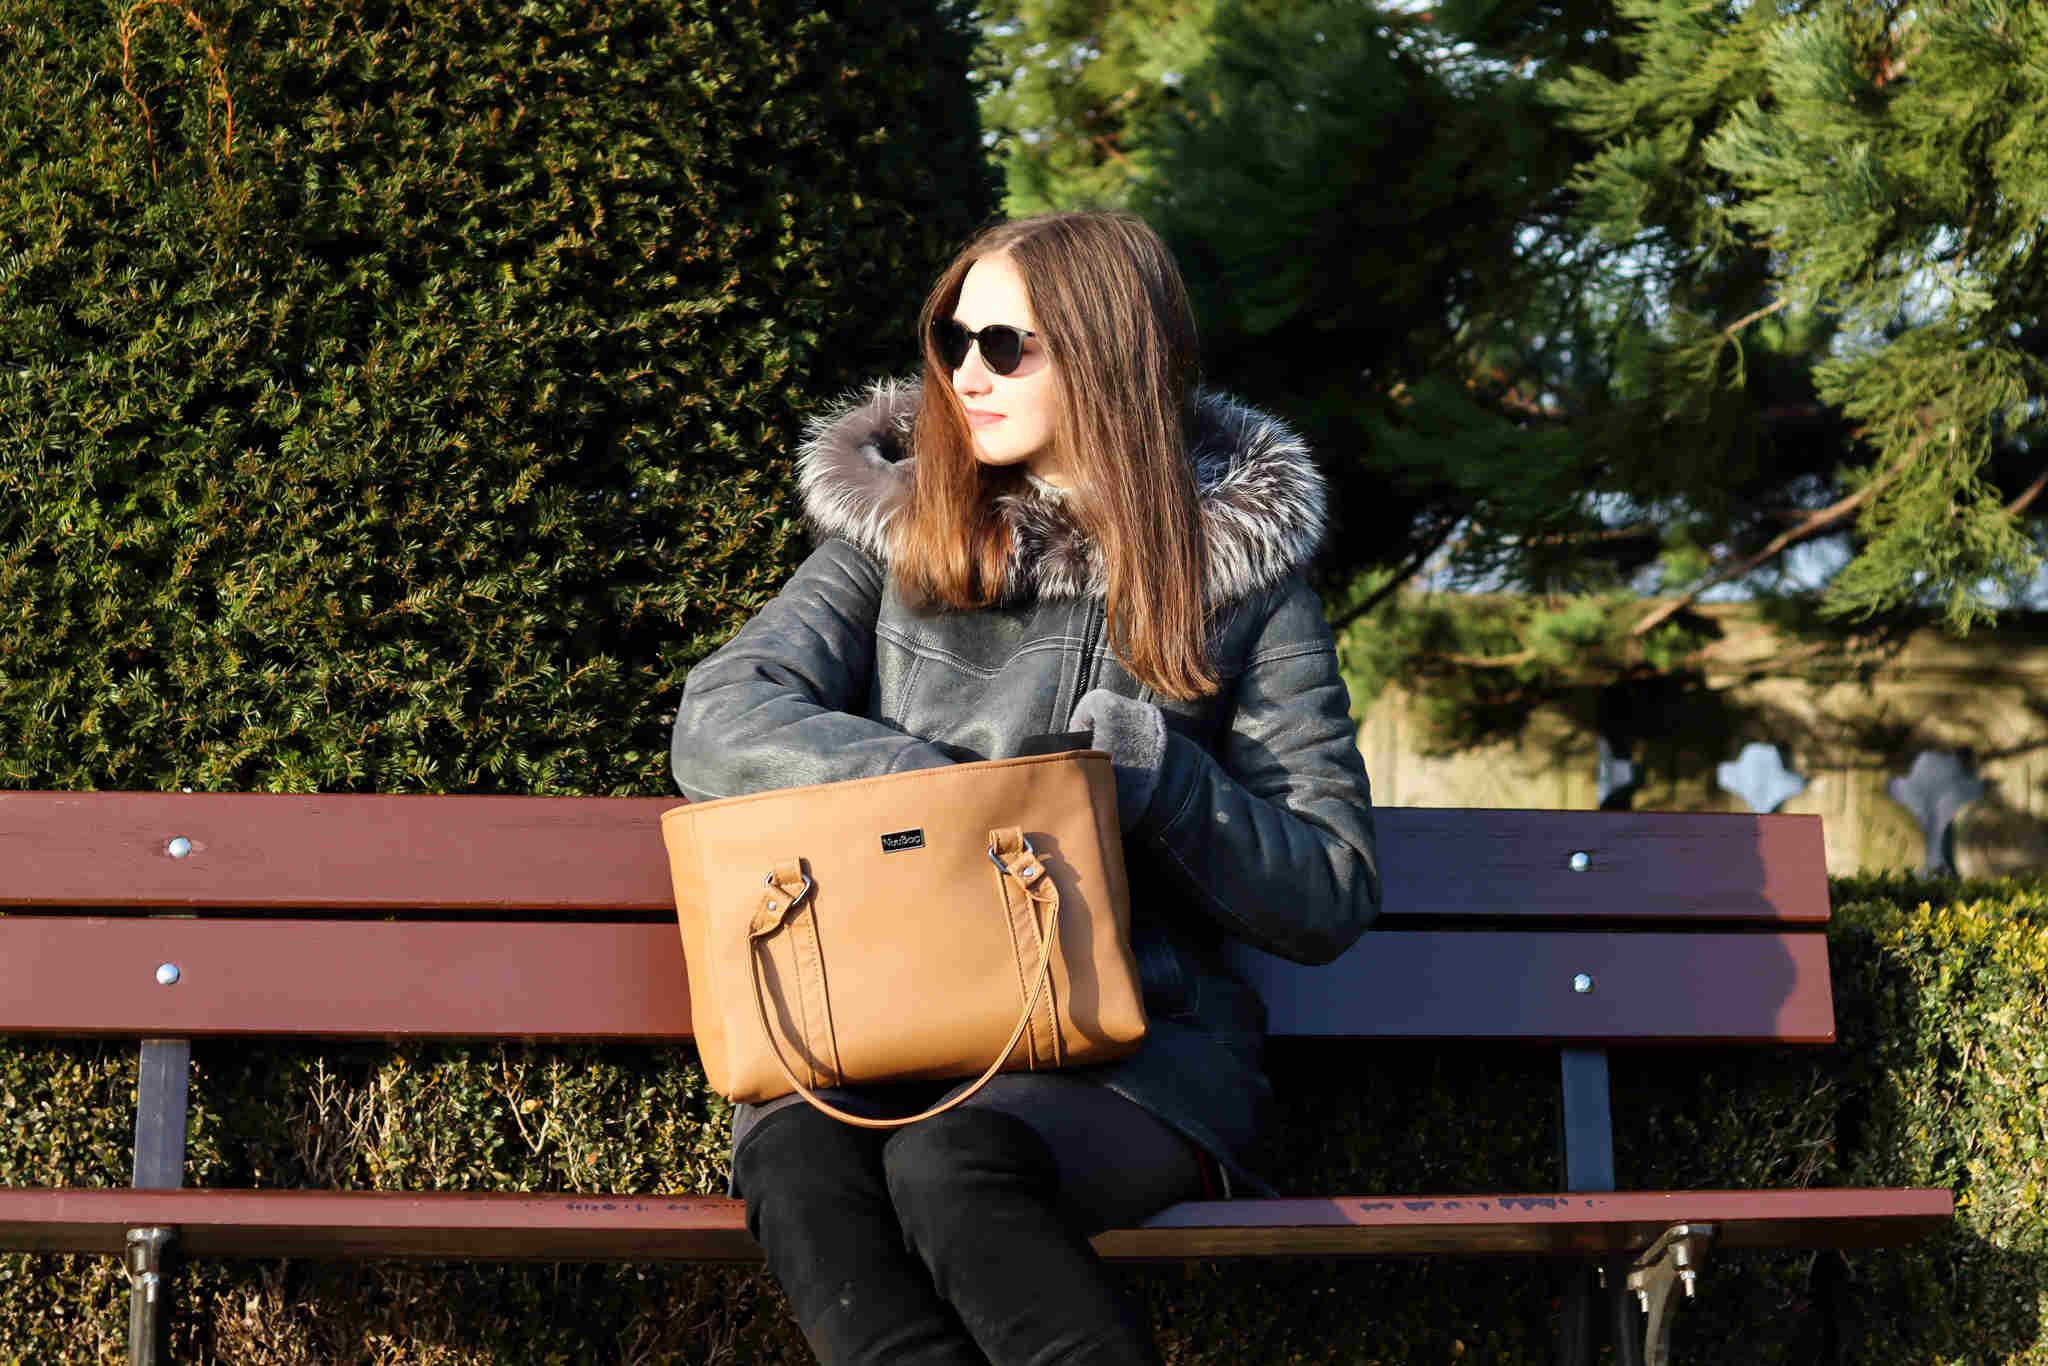 Beżowa torebka damska. Polskie torebki